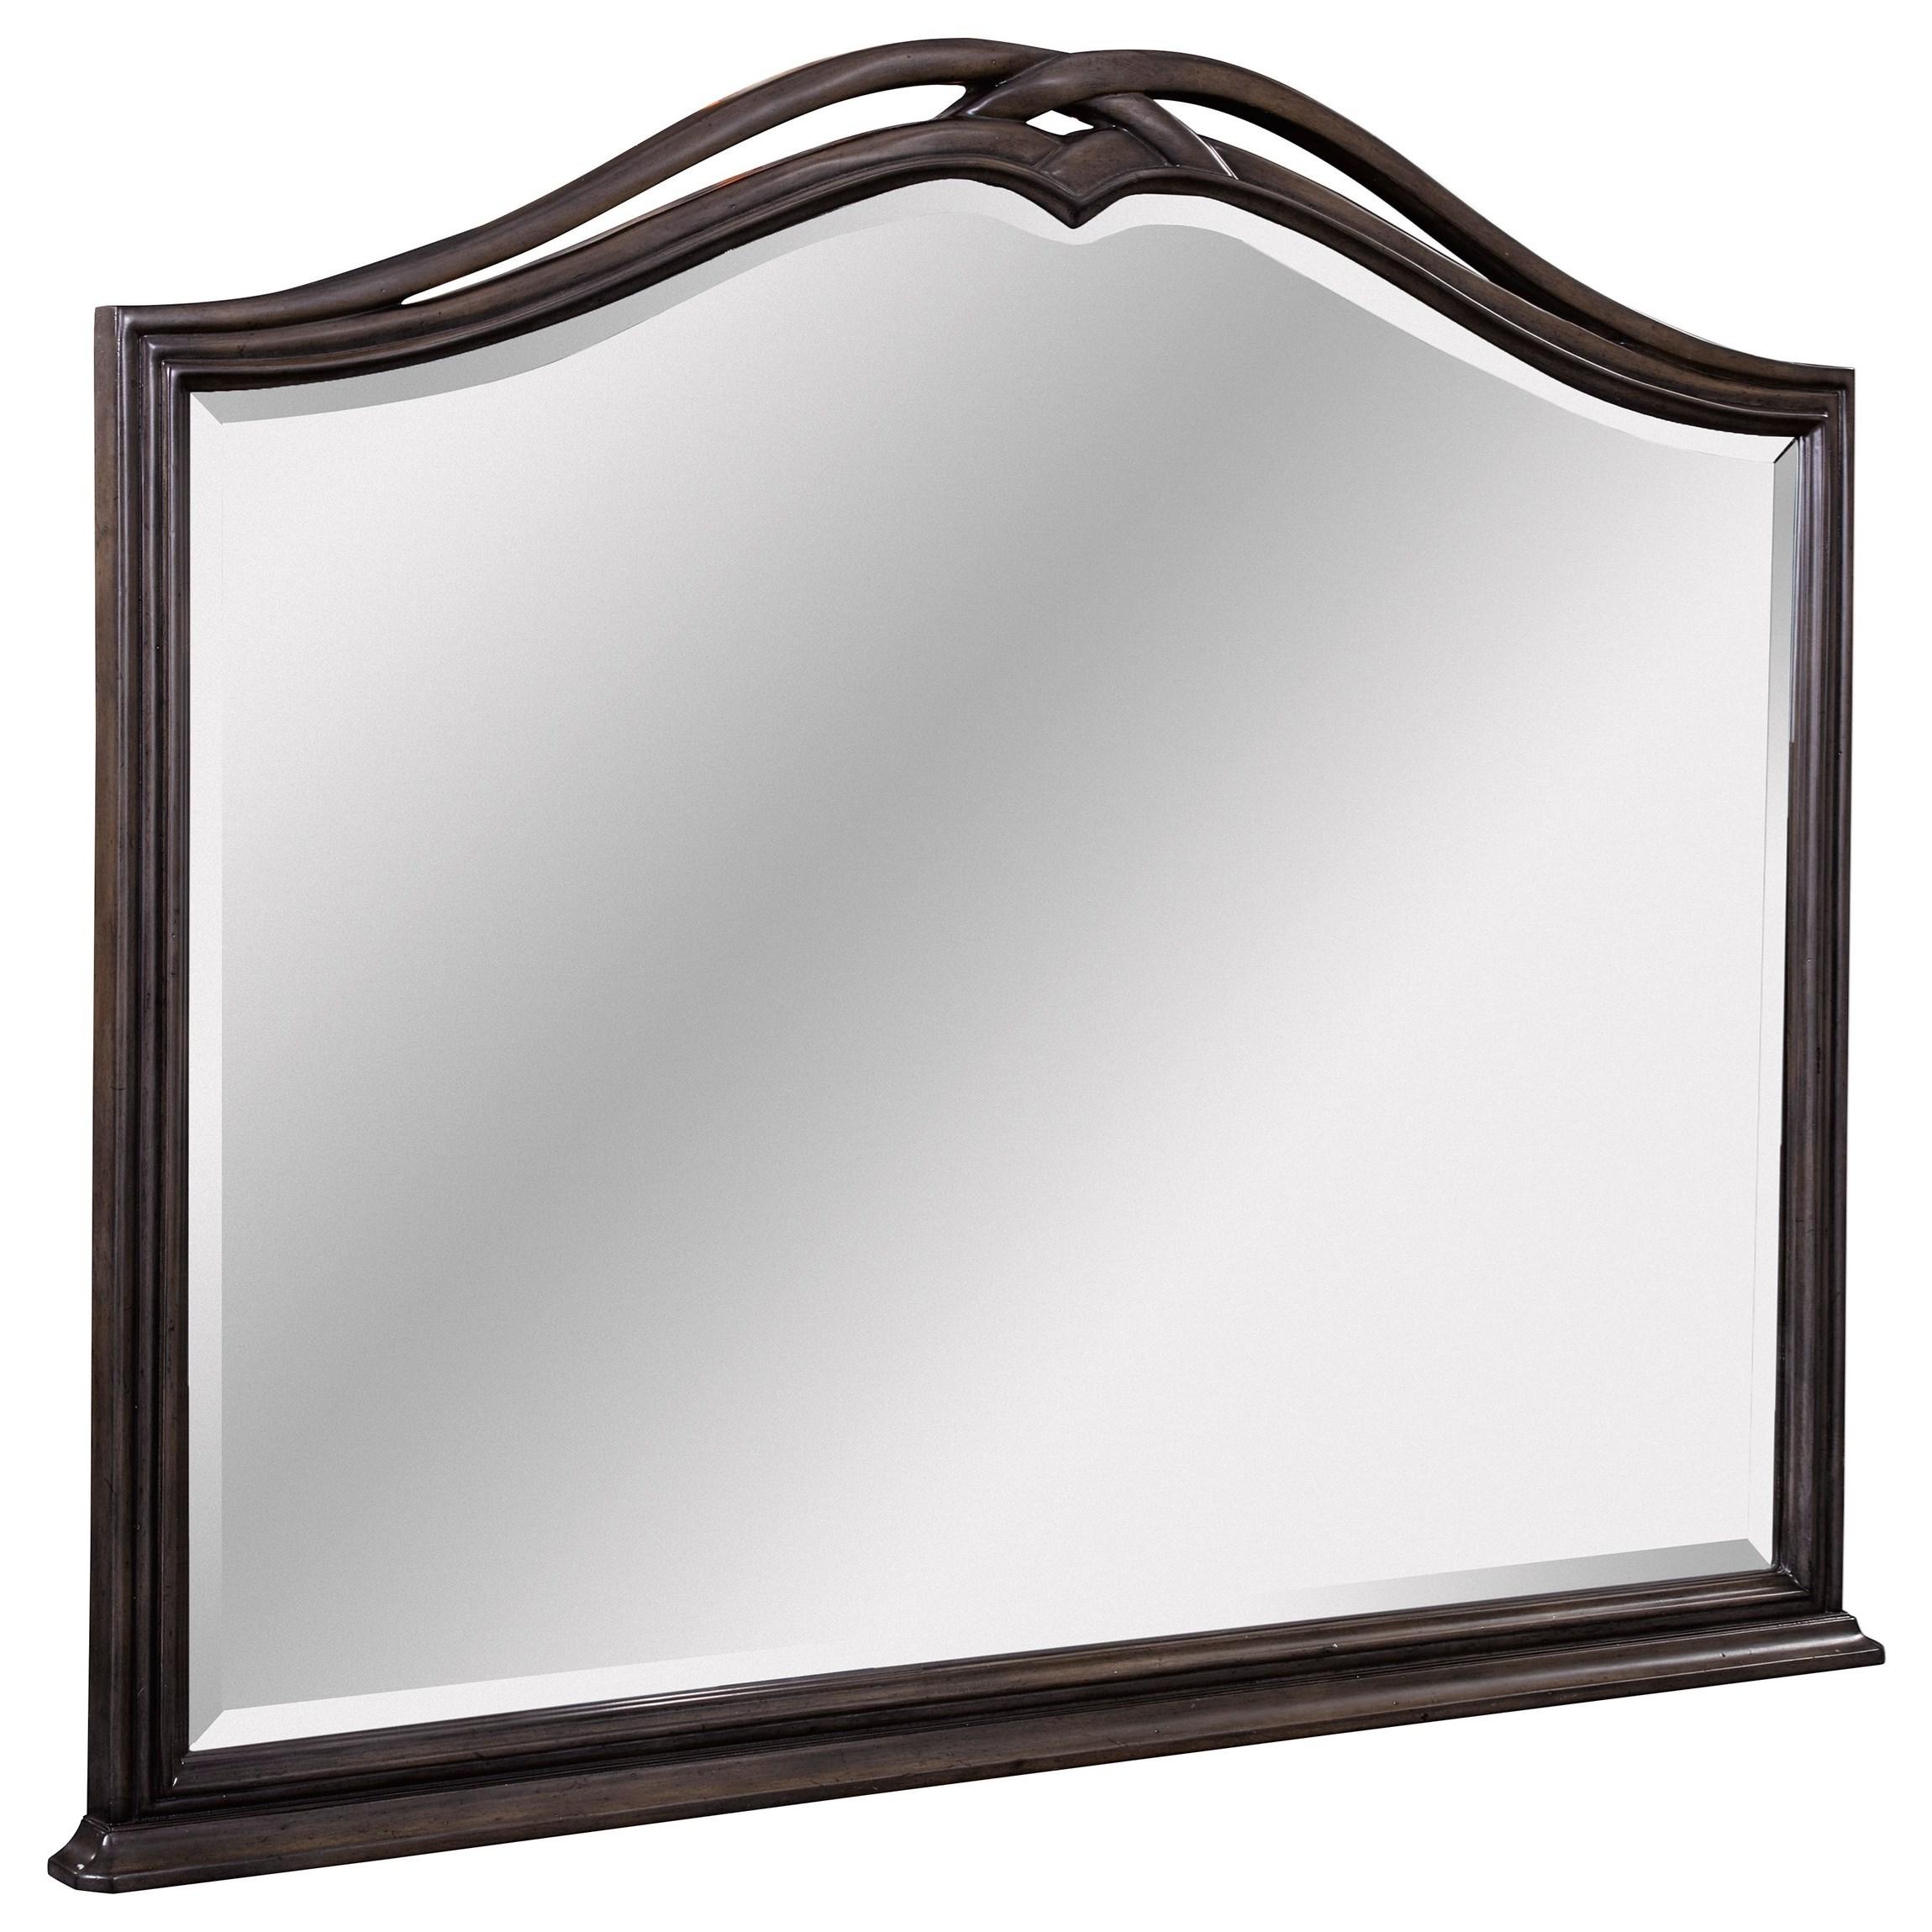 Broyhill Furniture Cashmera Mirror - Item Number: 4860-236